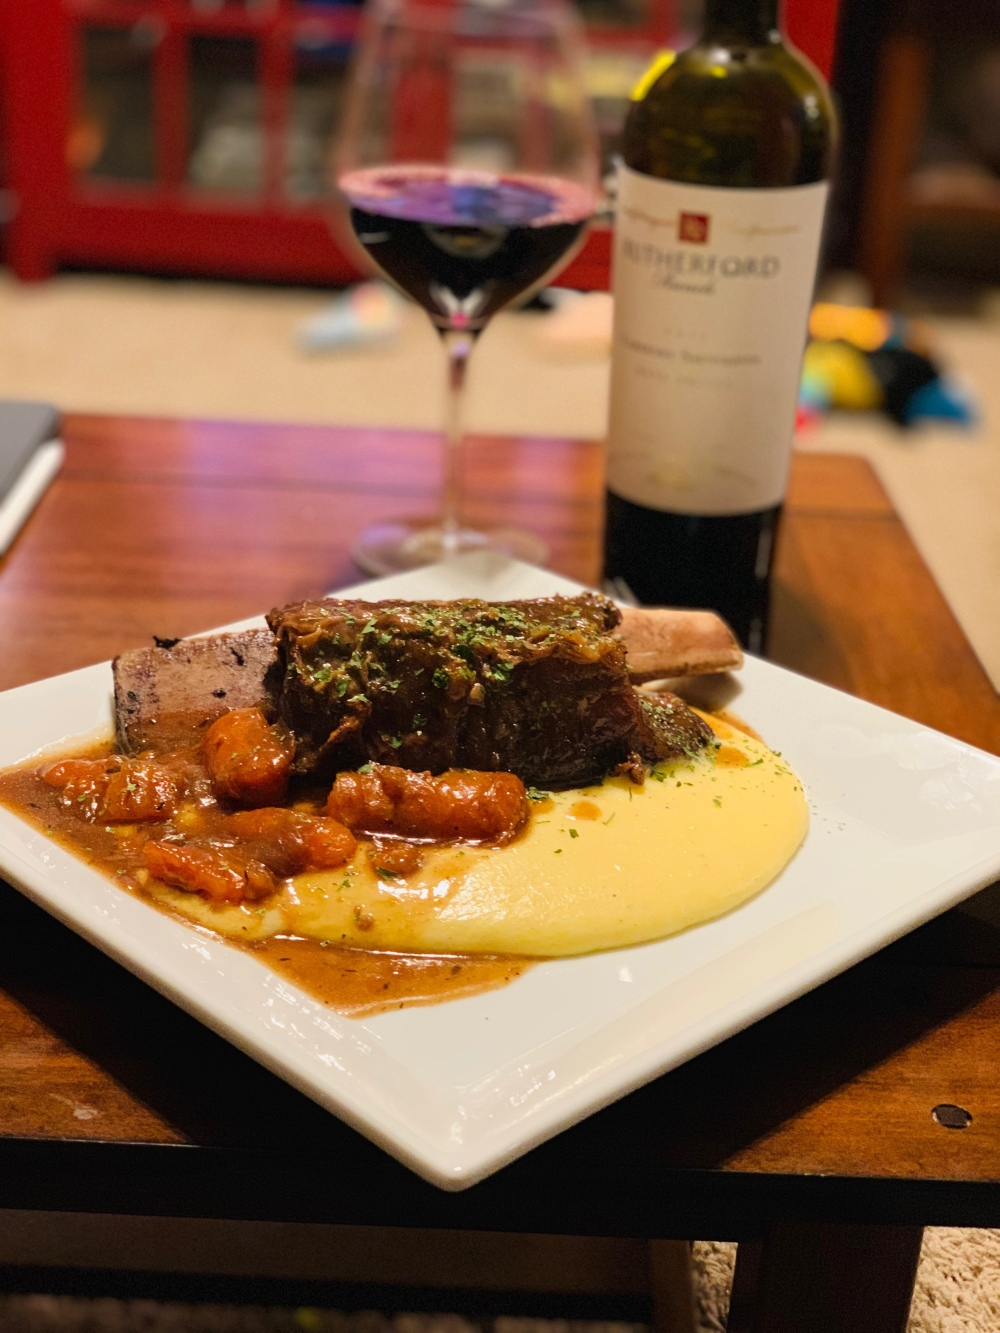 Cheesy Parmesan polenta & Short ribs braised in red wine!